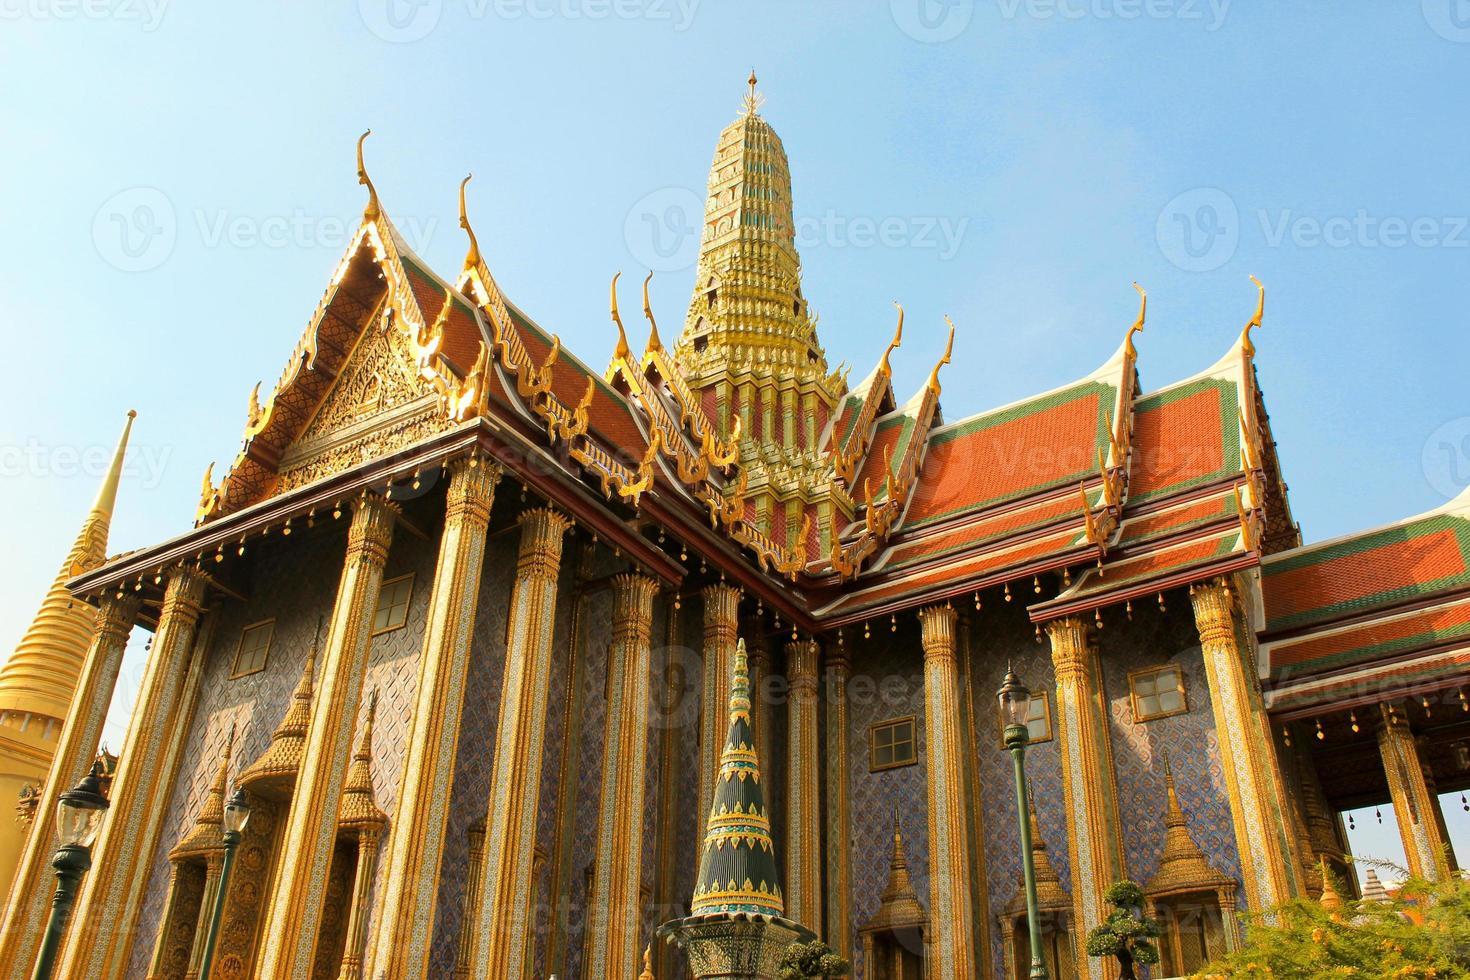 The famous Grand Palace in Bangkok Thailand photo